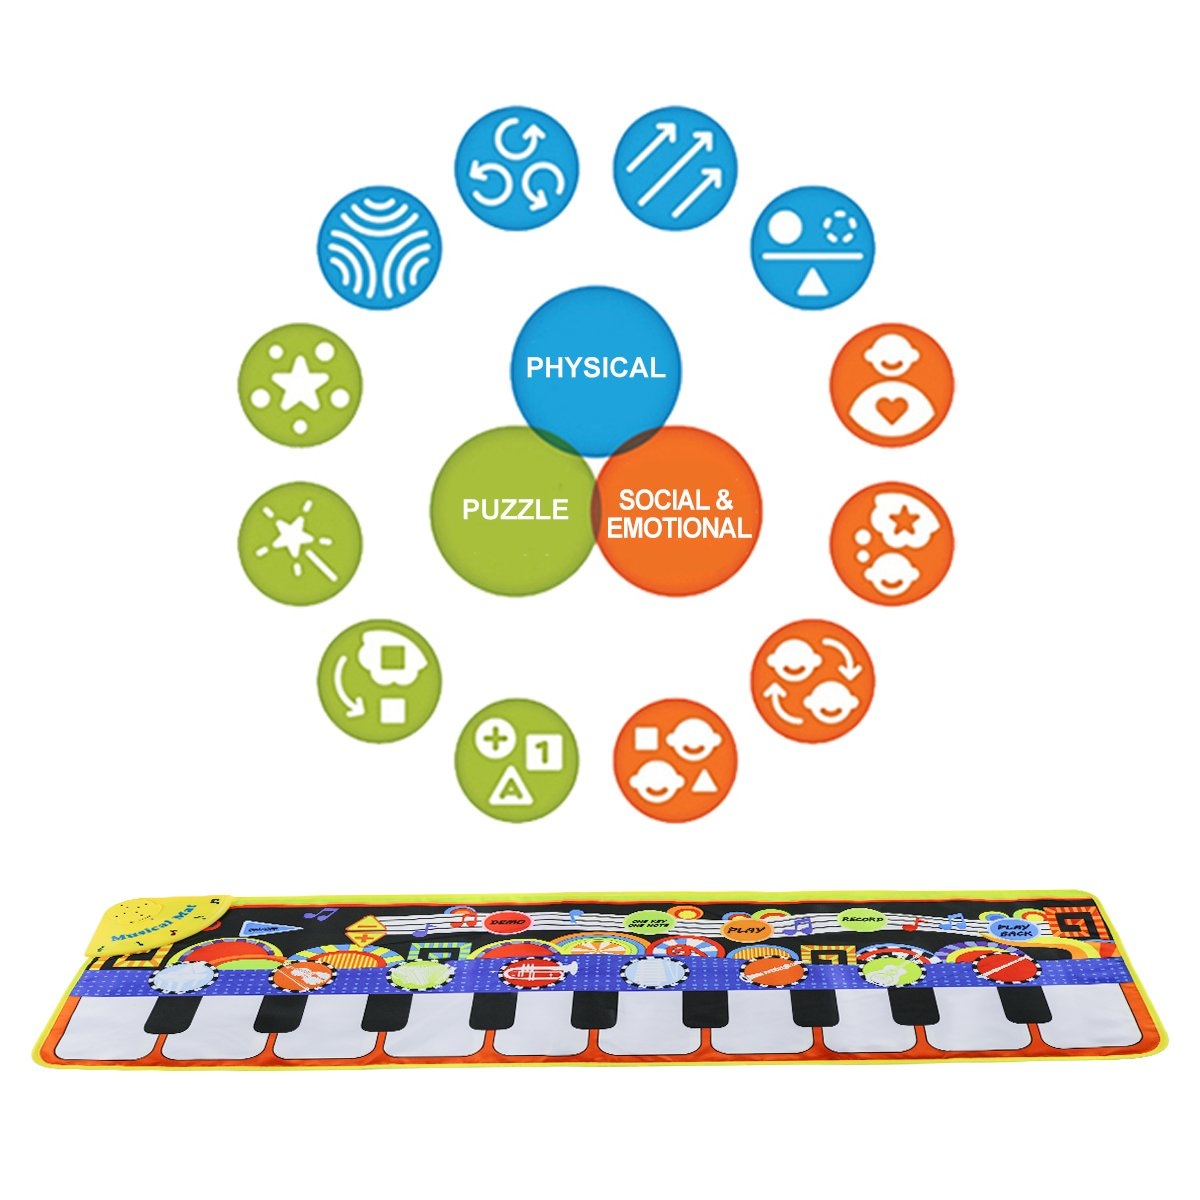 Musical Piano Mat 19 Keys Piano Keyboard Play mat Portable Musical Blanket Build-In Speaker /& Recording Function For Kids Toddler Girls Boys MaGic-Store